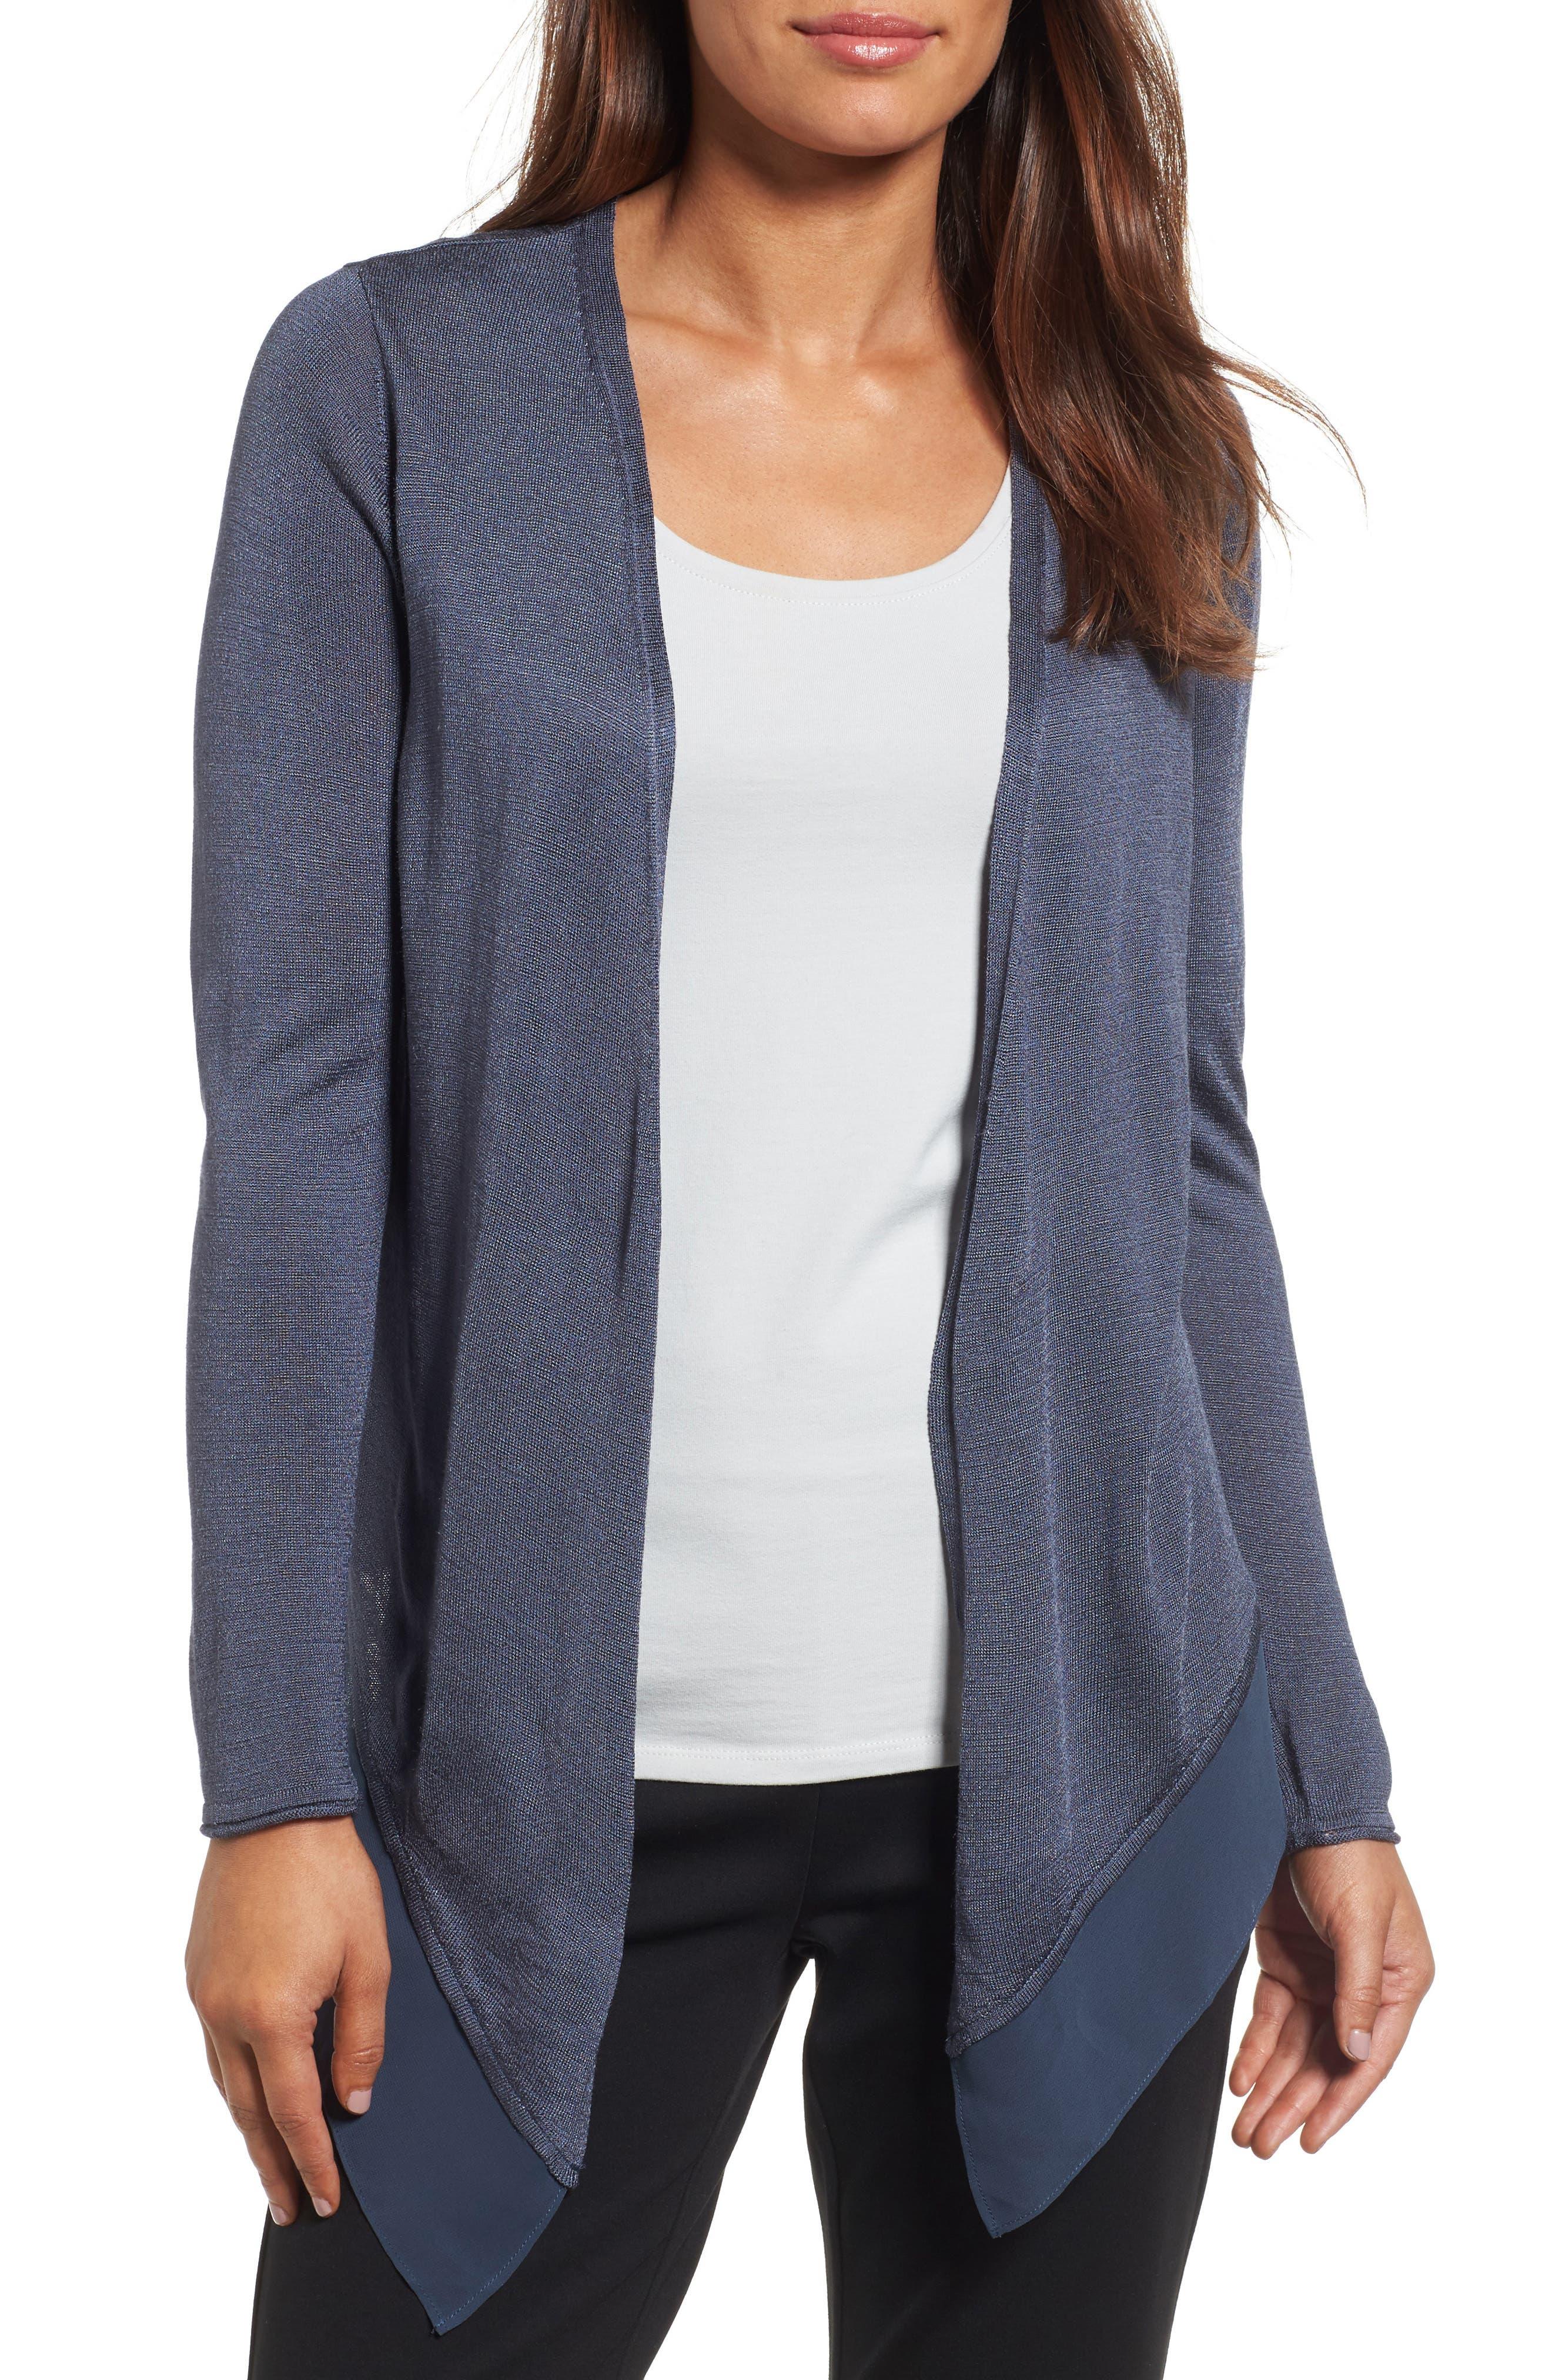 Main Image - NIC+ZOE Paired Up Silk Blend Cardigan (Regular & Petite)